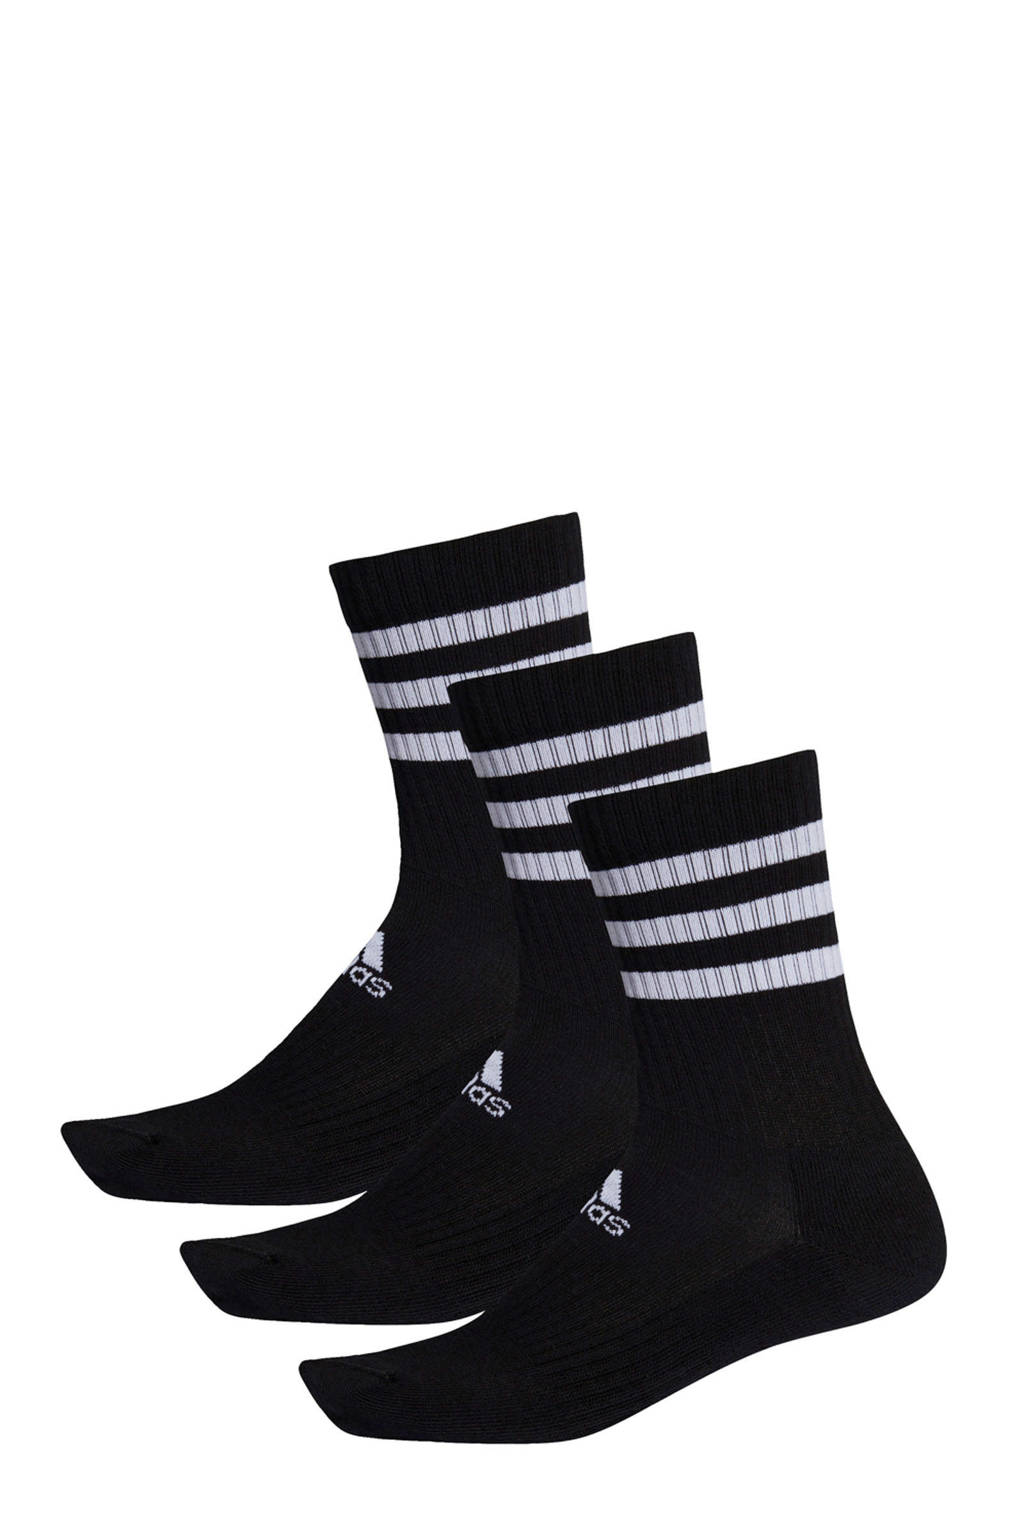 adidas Performance   sportsokken wit/zwart (set van 3), Zwart/wit